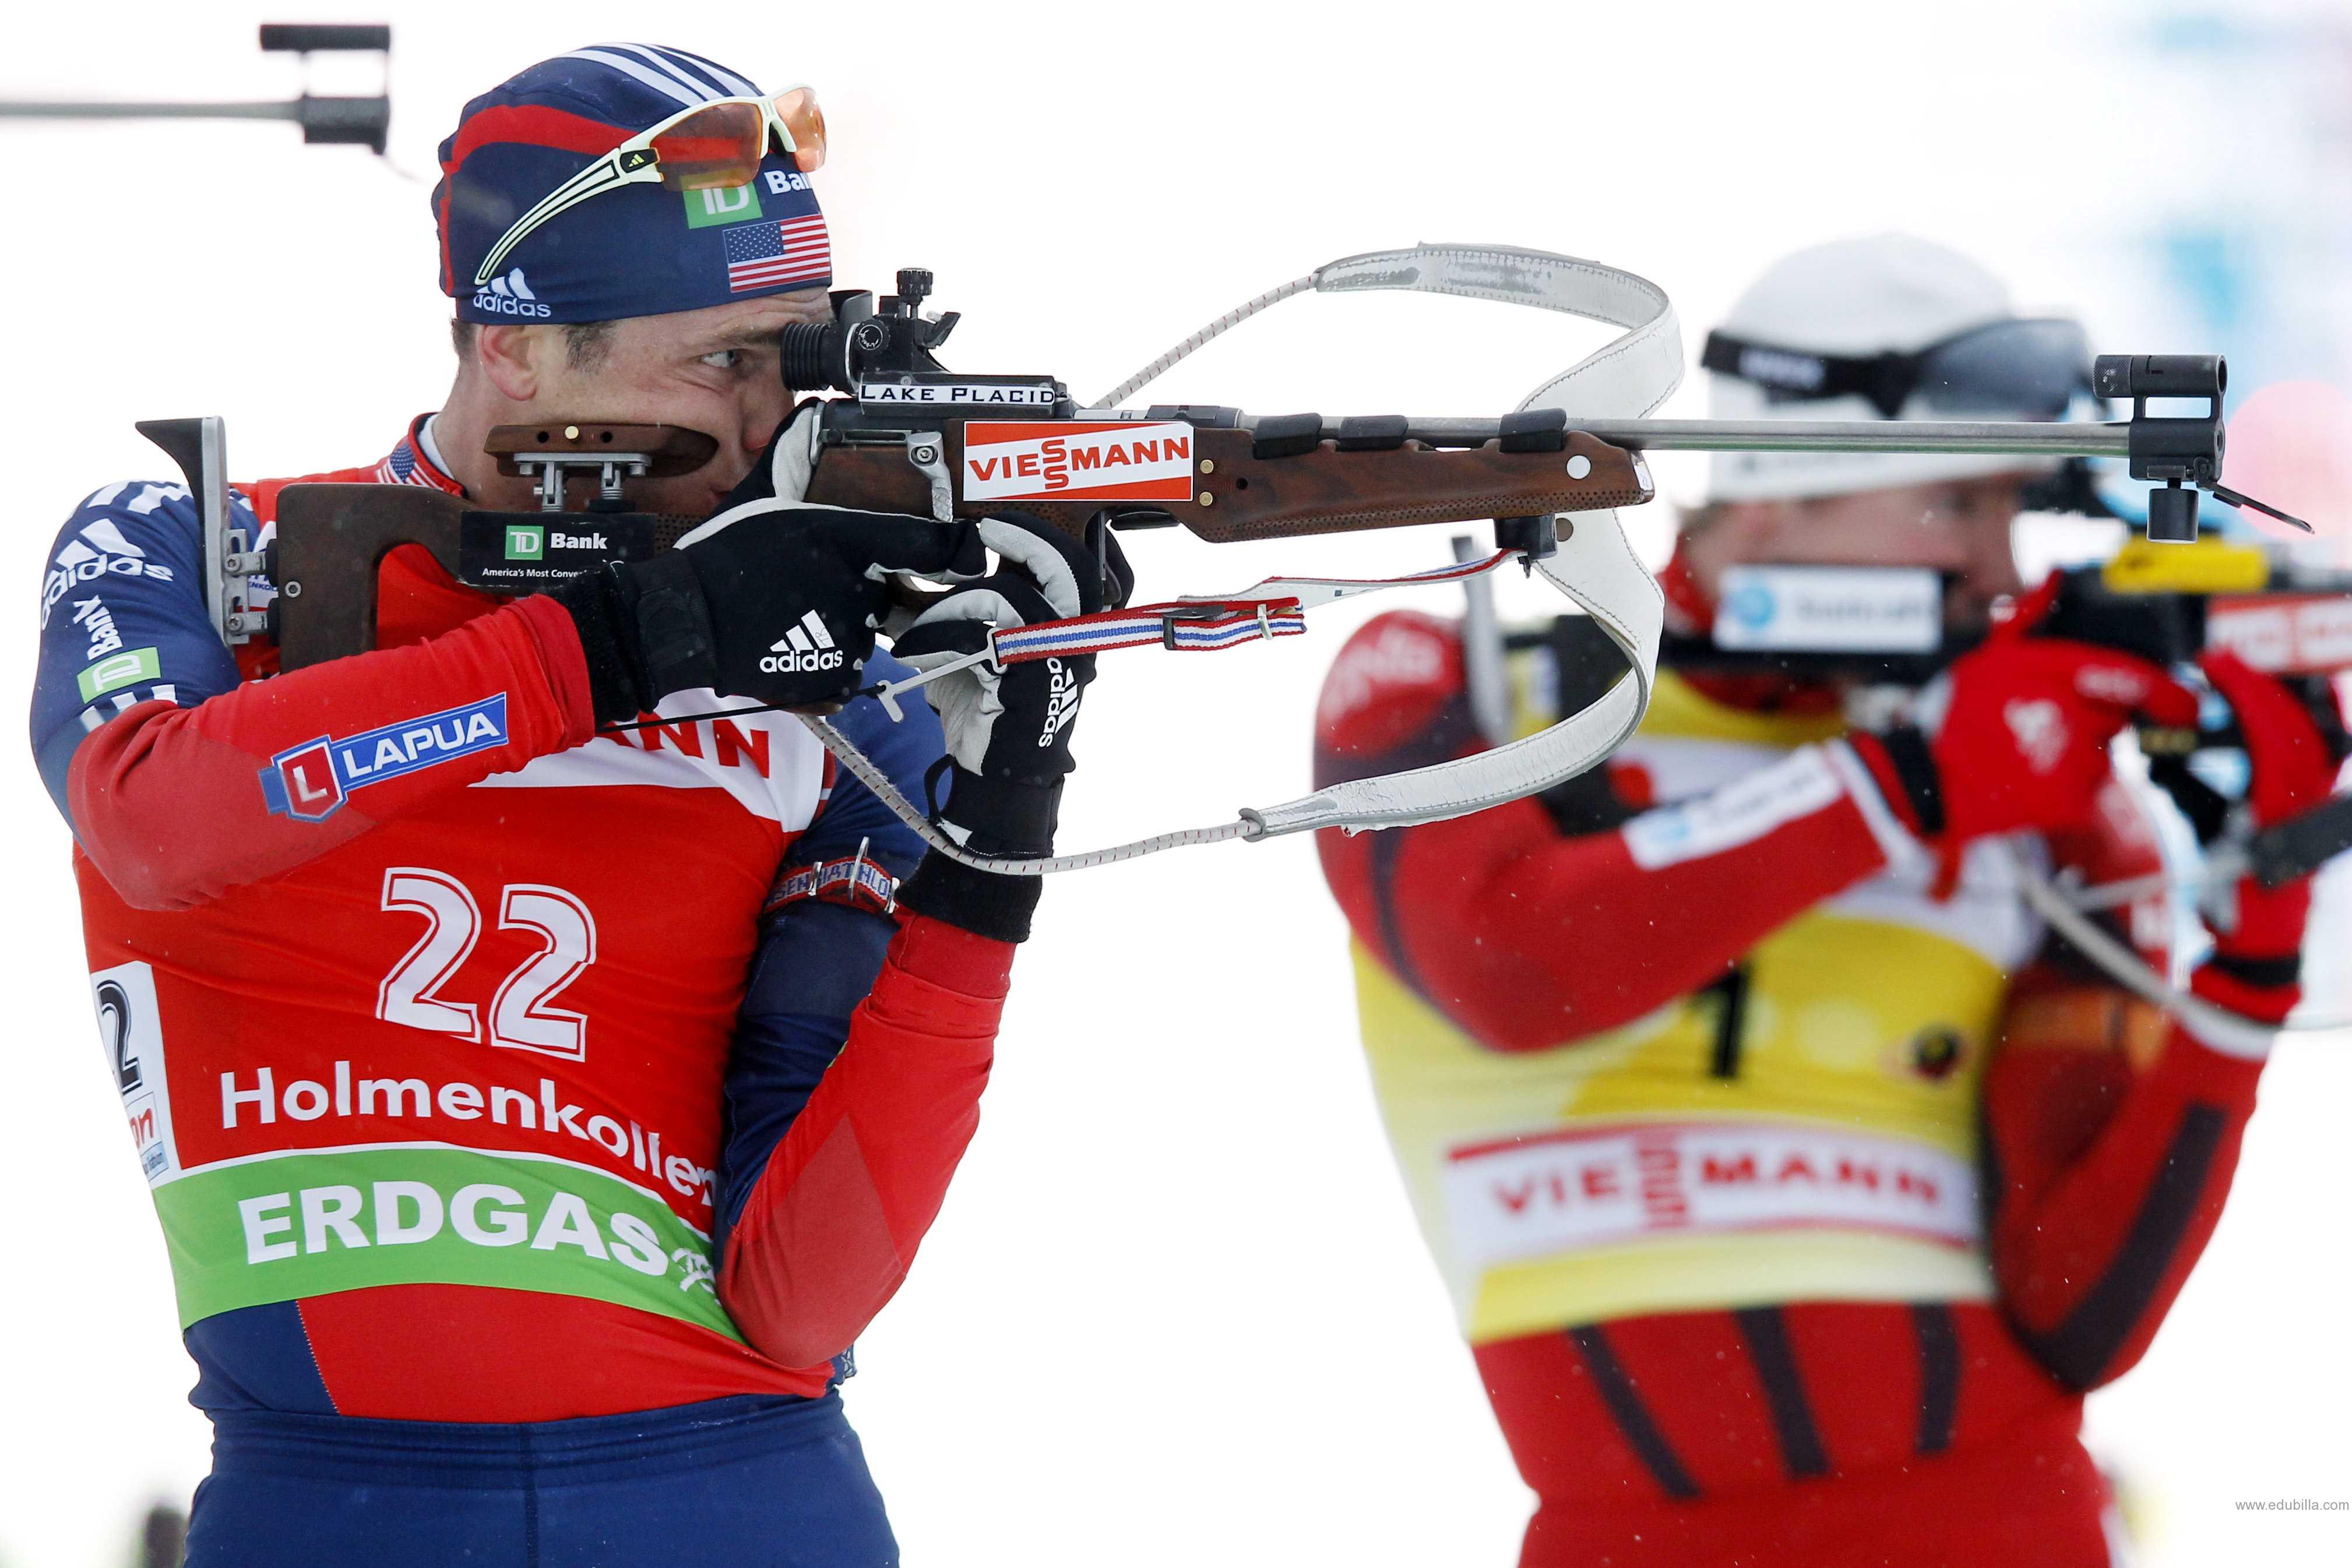 Biathlon games,Biathlon rules,Biathlon awards,Biathlon equipments ...